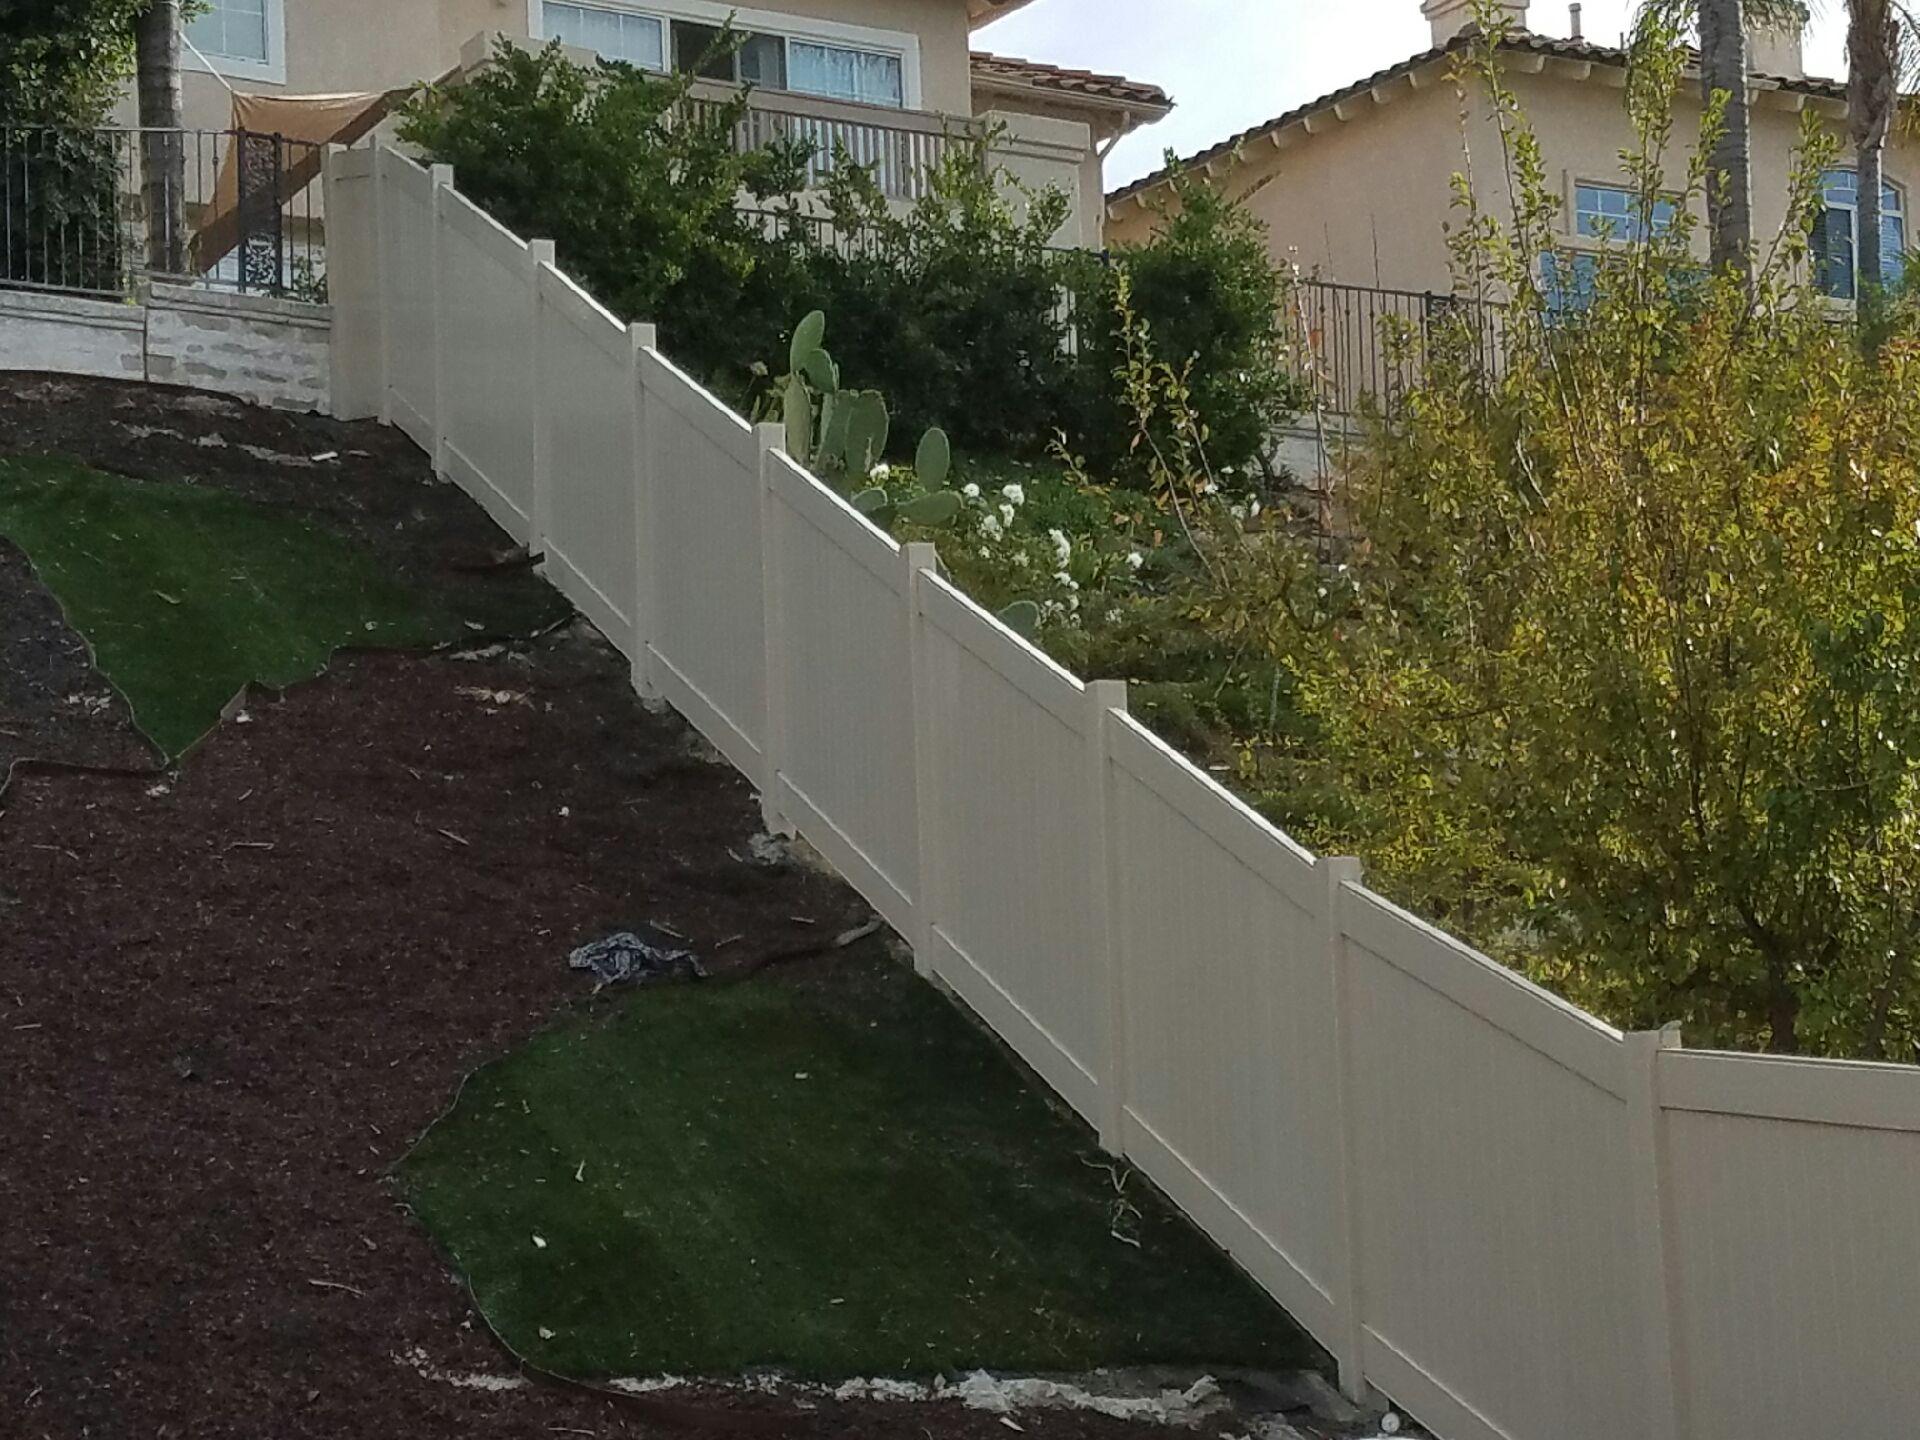 3T Fence image 35